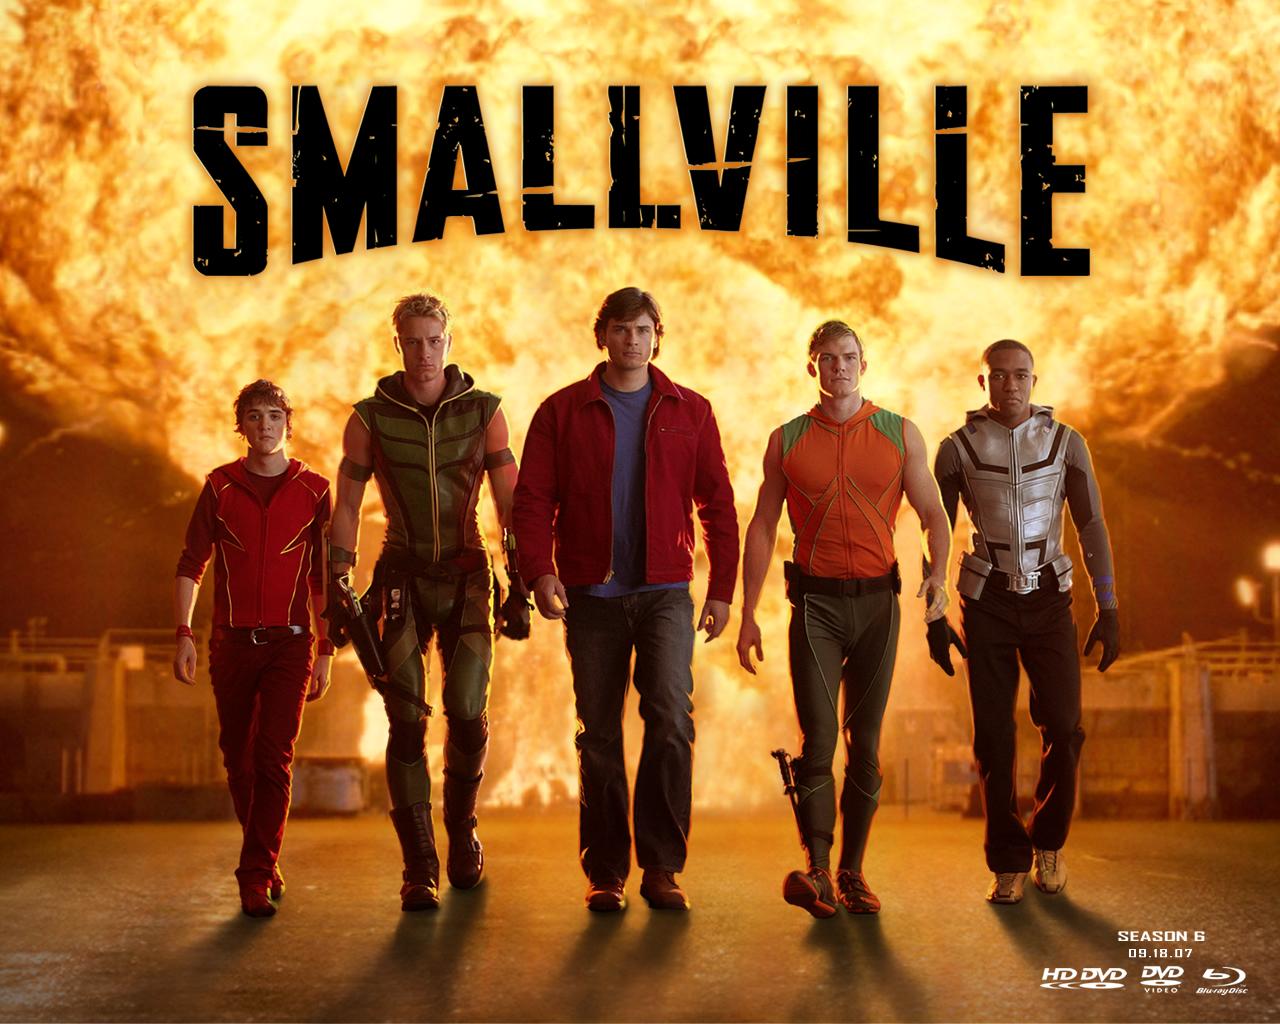 legenda smallville: